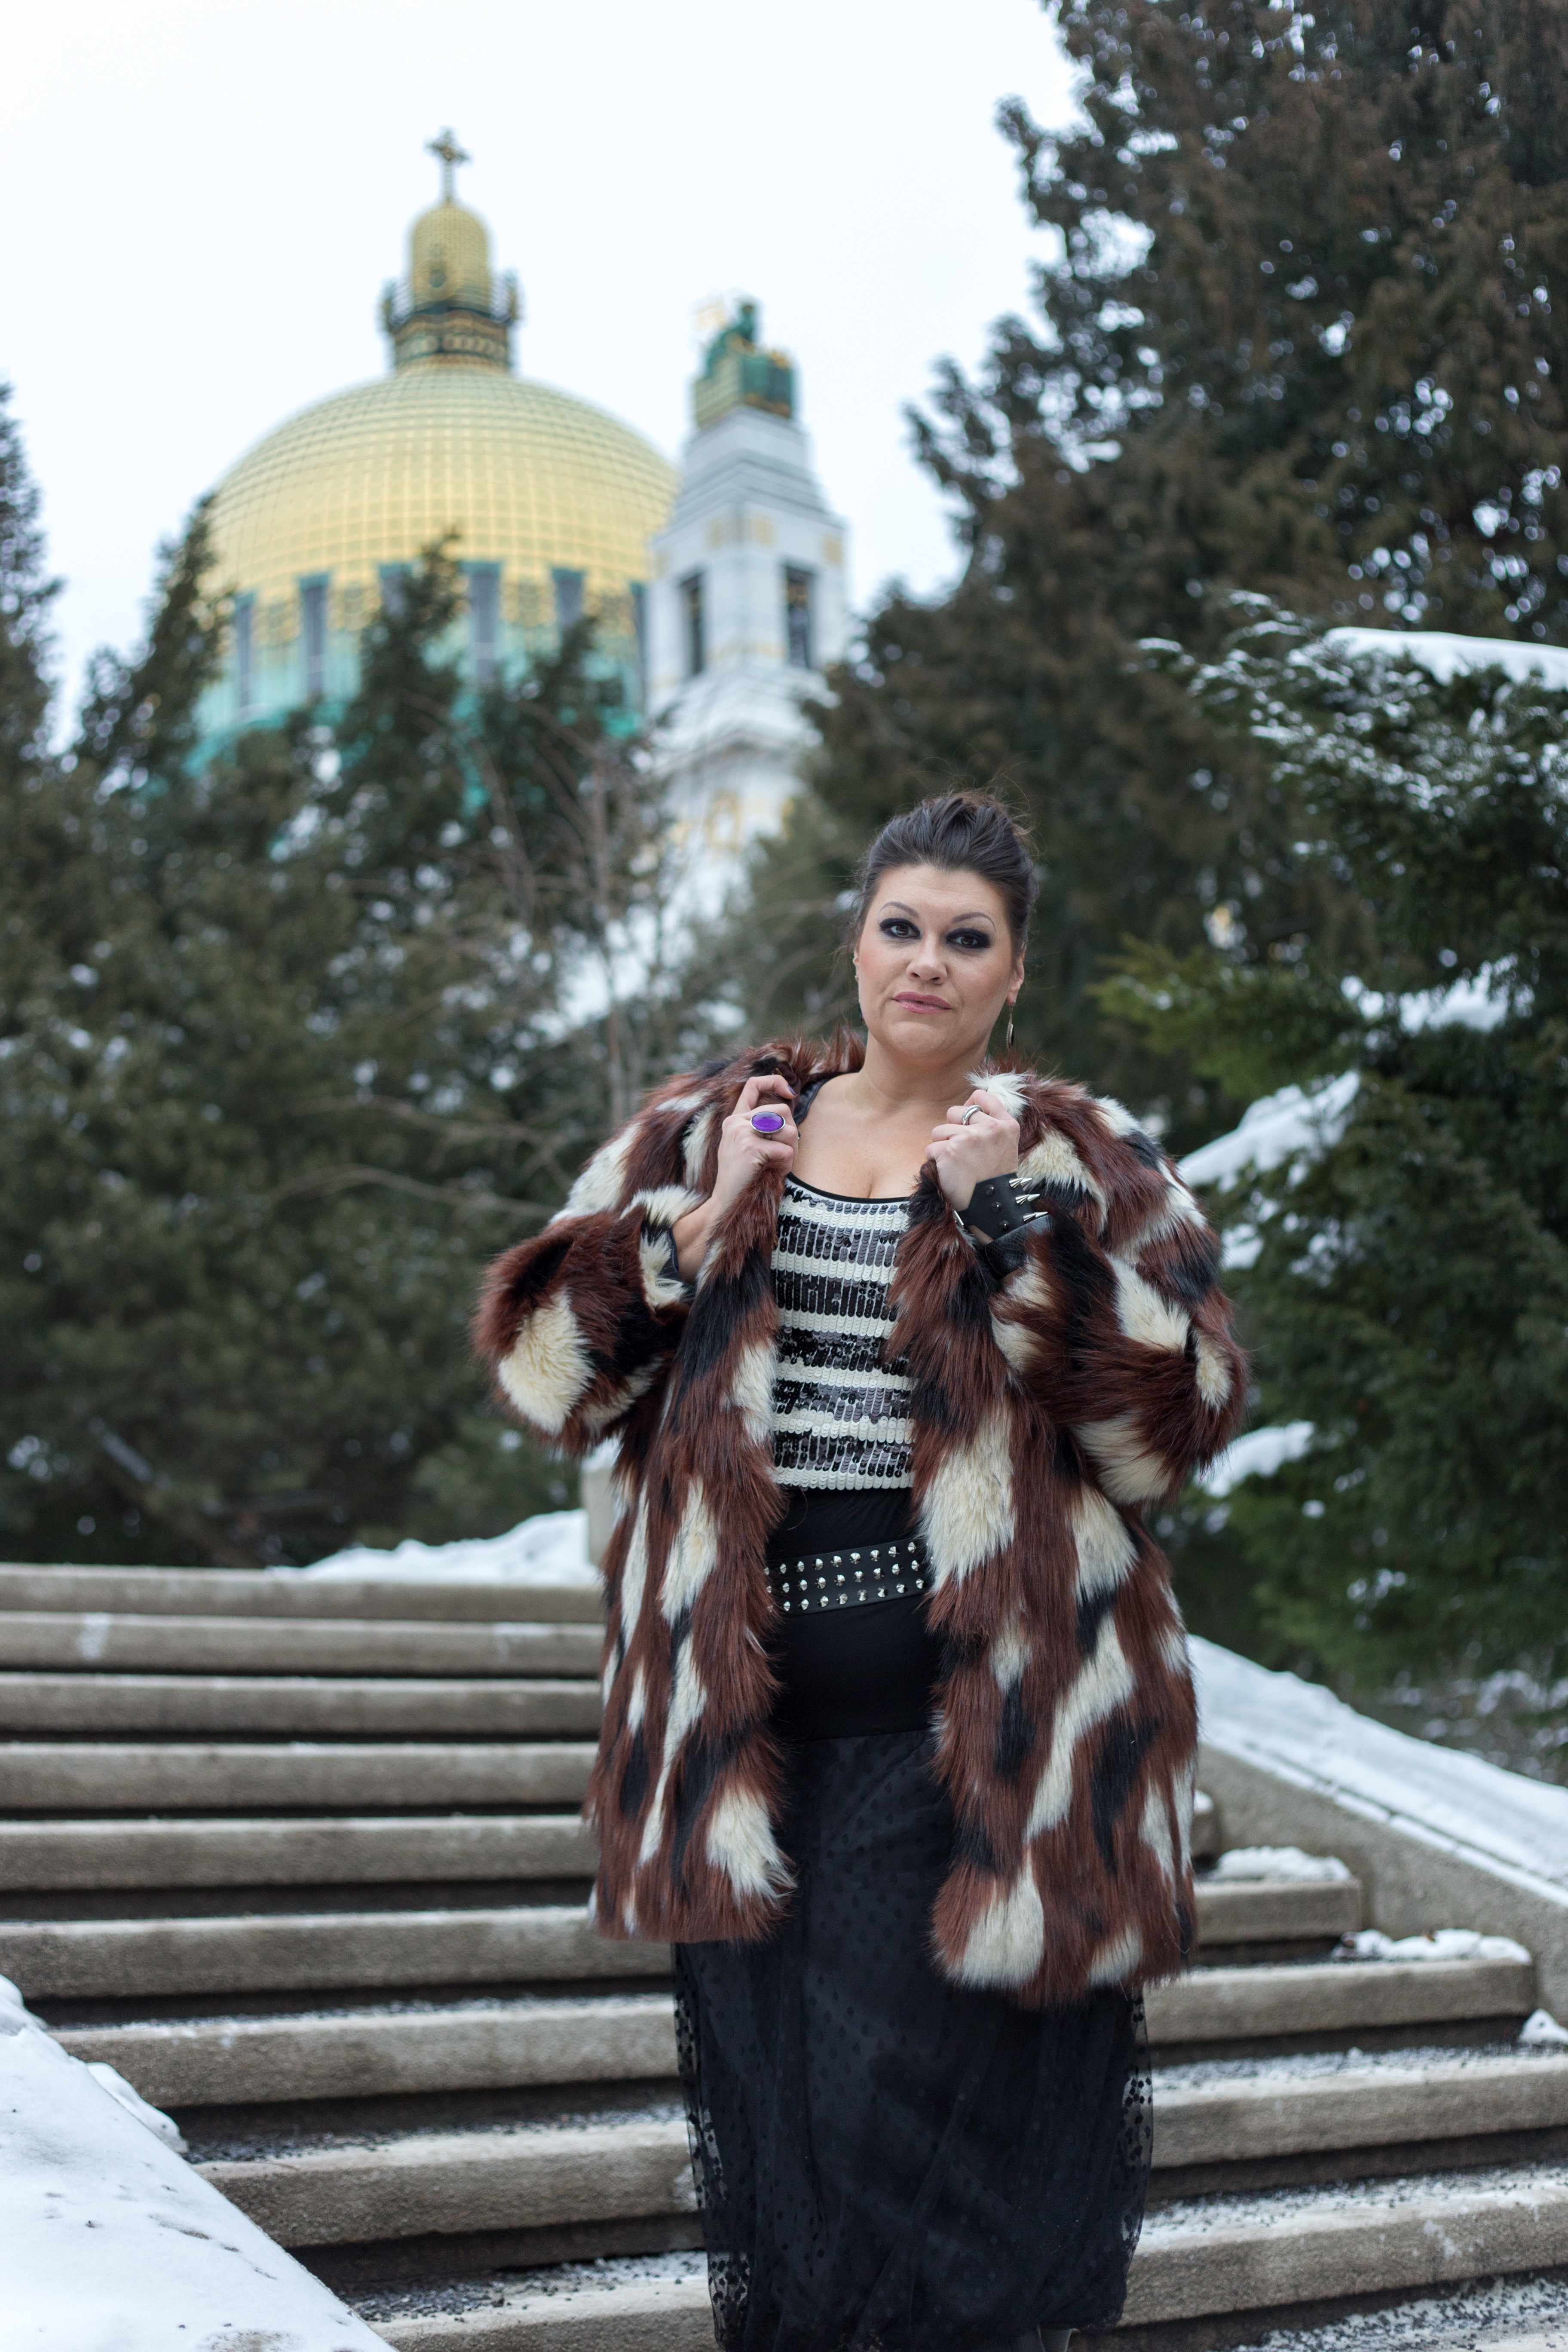 madonna blogger award navabi fauxfur plussize fashion devil queen outfit look fakefur snowwhite kardiaserena pelz